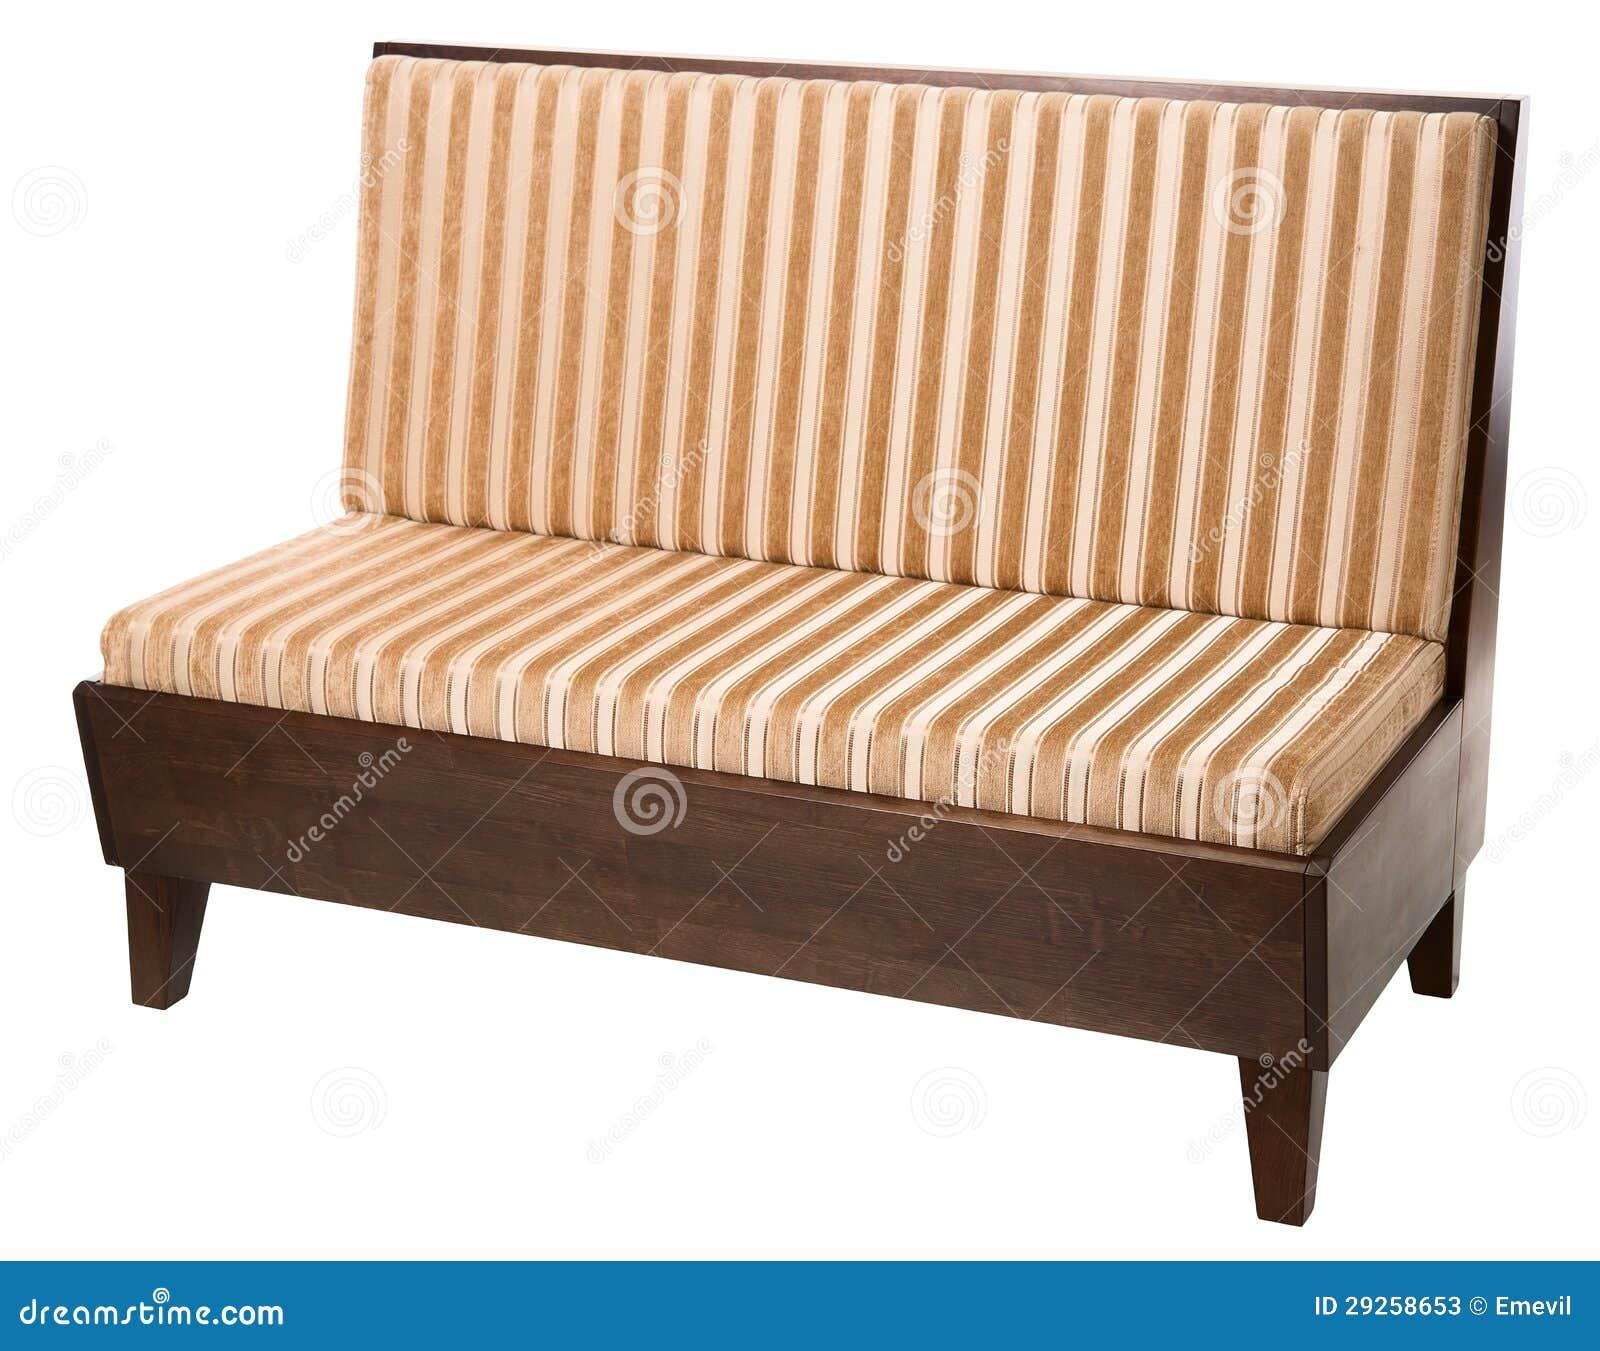 Muebles tapizados imagen de archivo. Imagen de detalle - 29258653